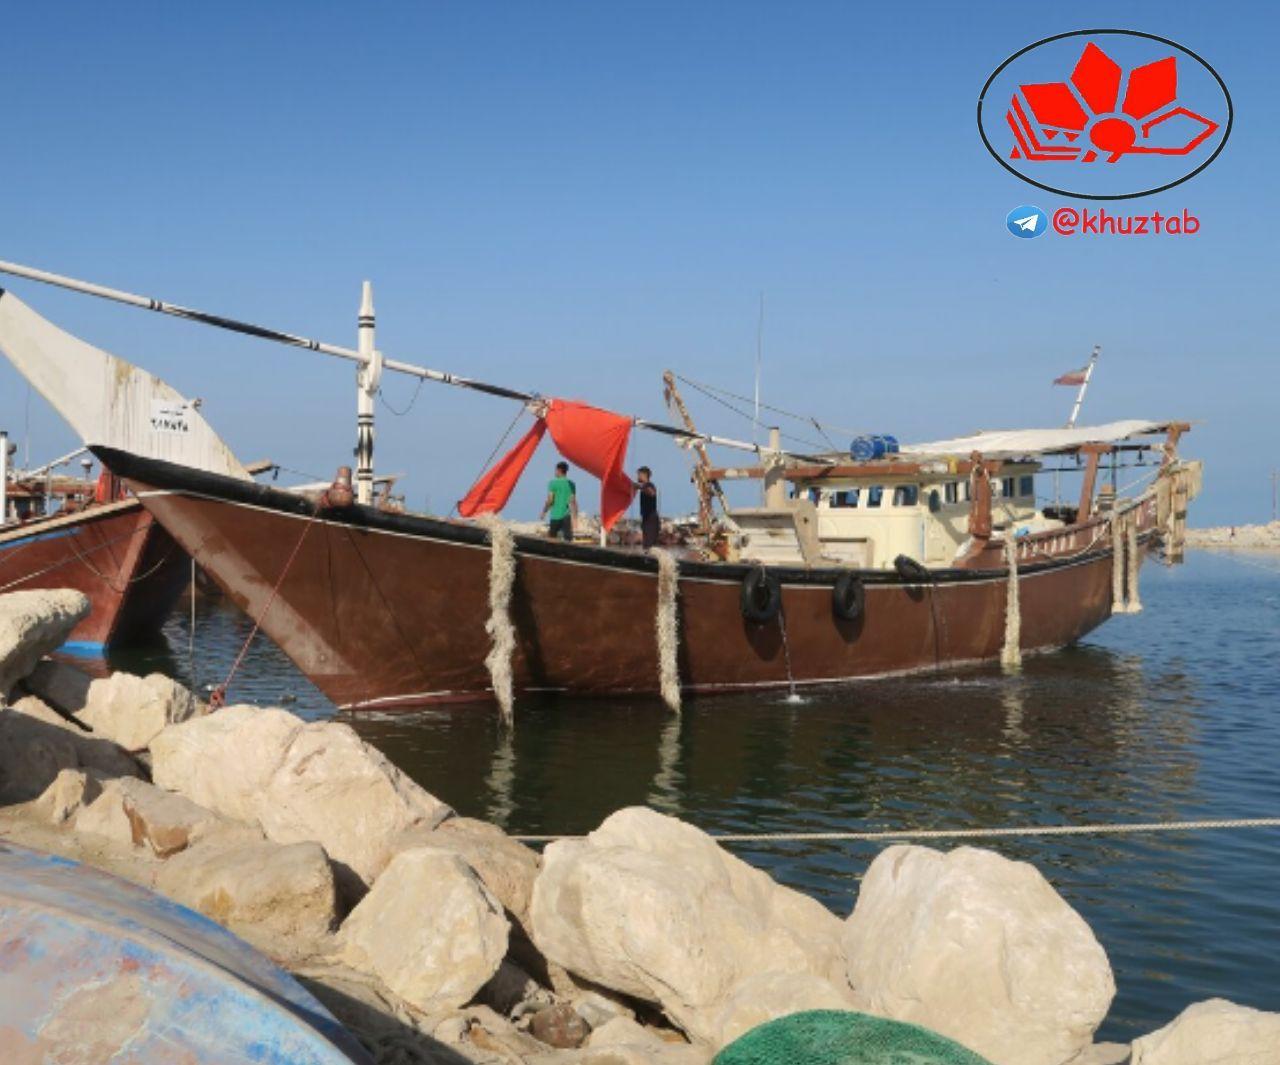 IMG 20190914 163659 901 اغاز ثبت شناورهای تجاری متقاضی کالای ته لنجی در اروند کنار